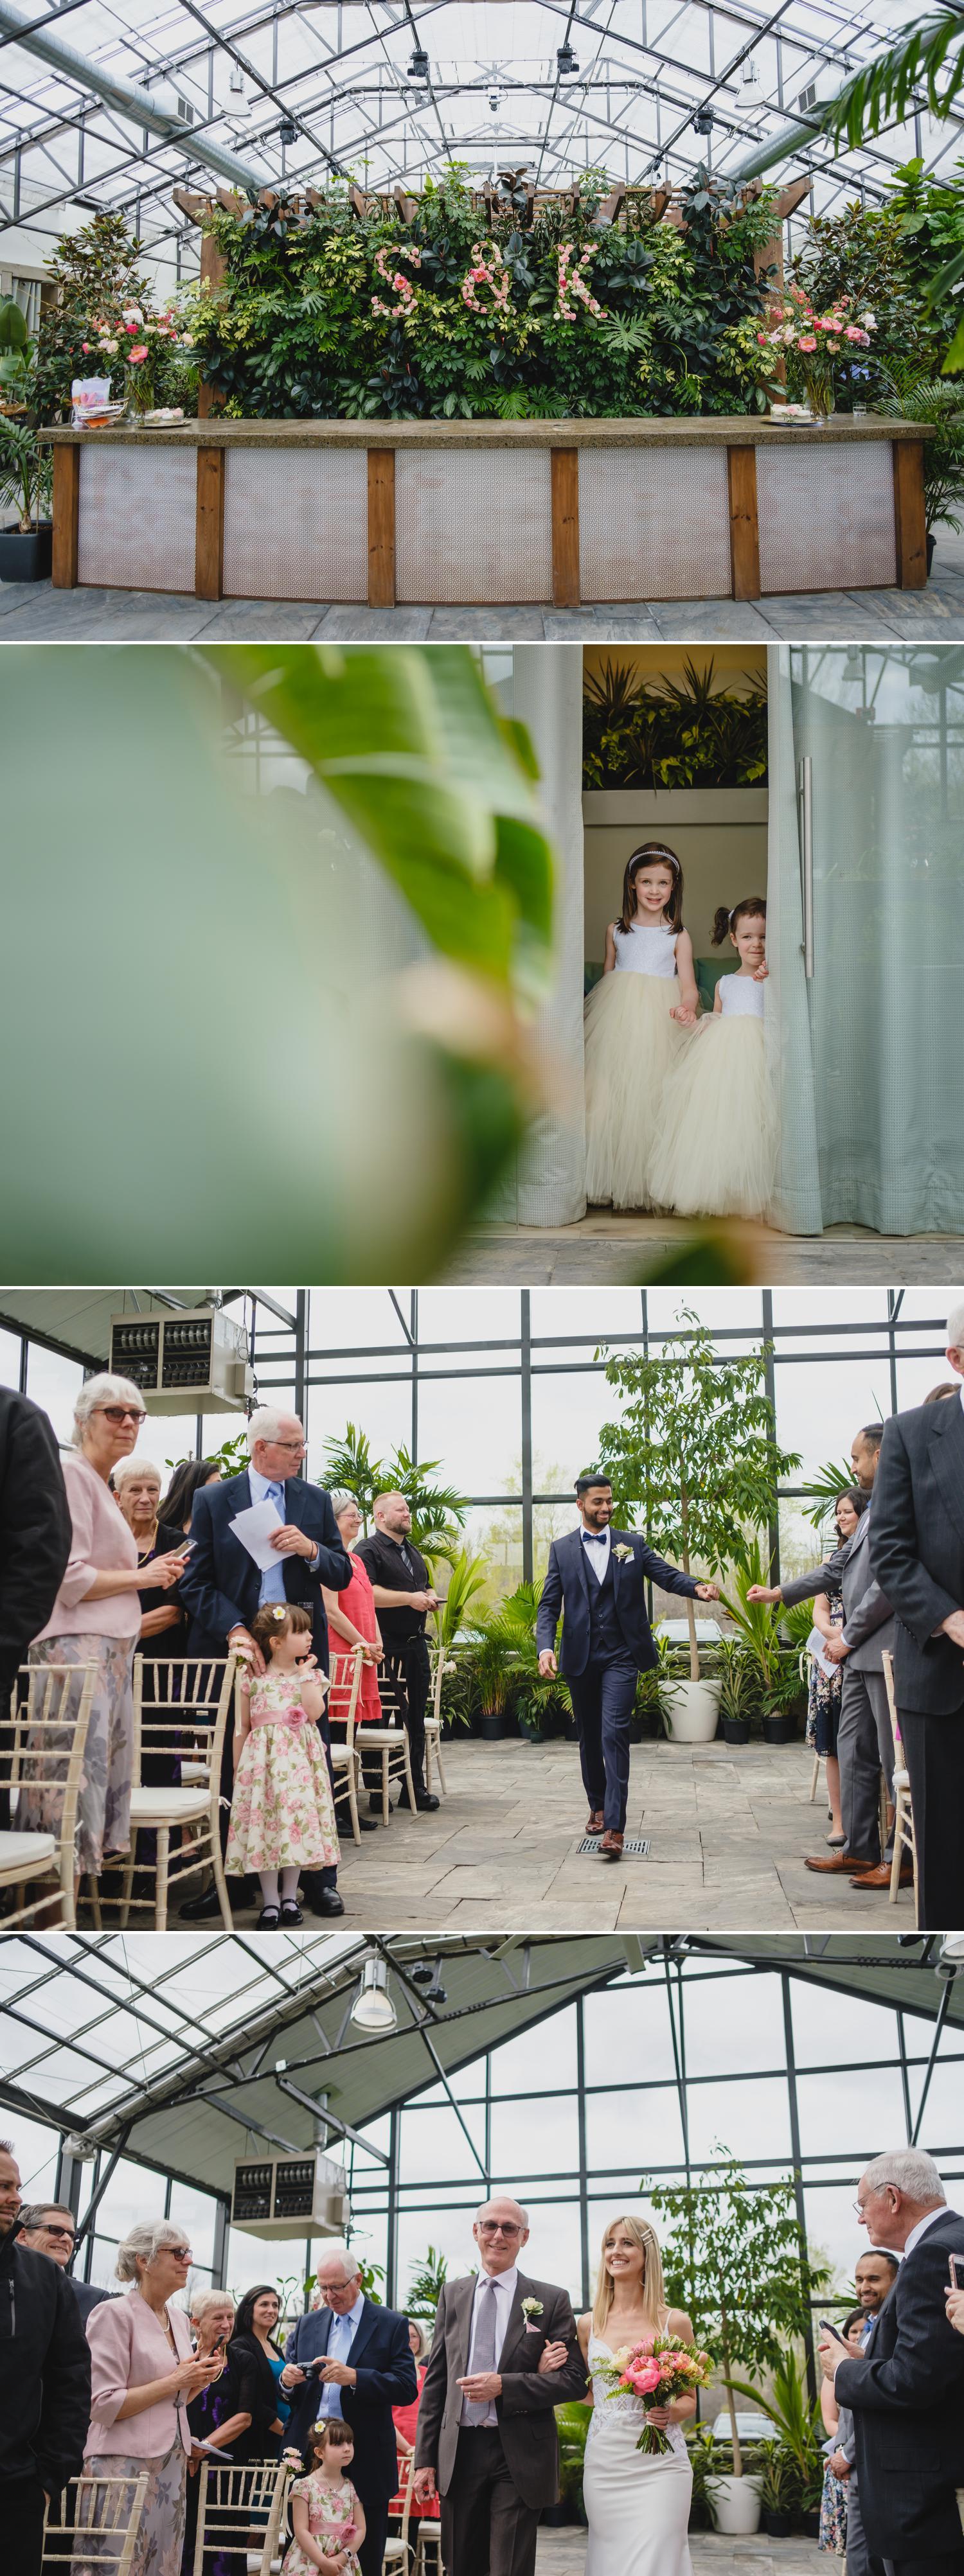 wedding ceremony at aquatopia in ottawa